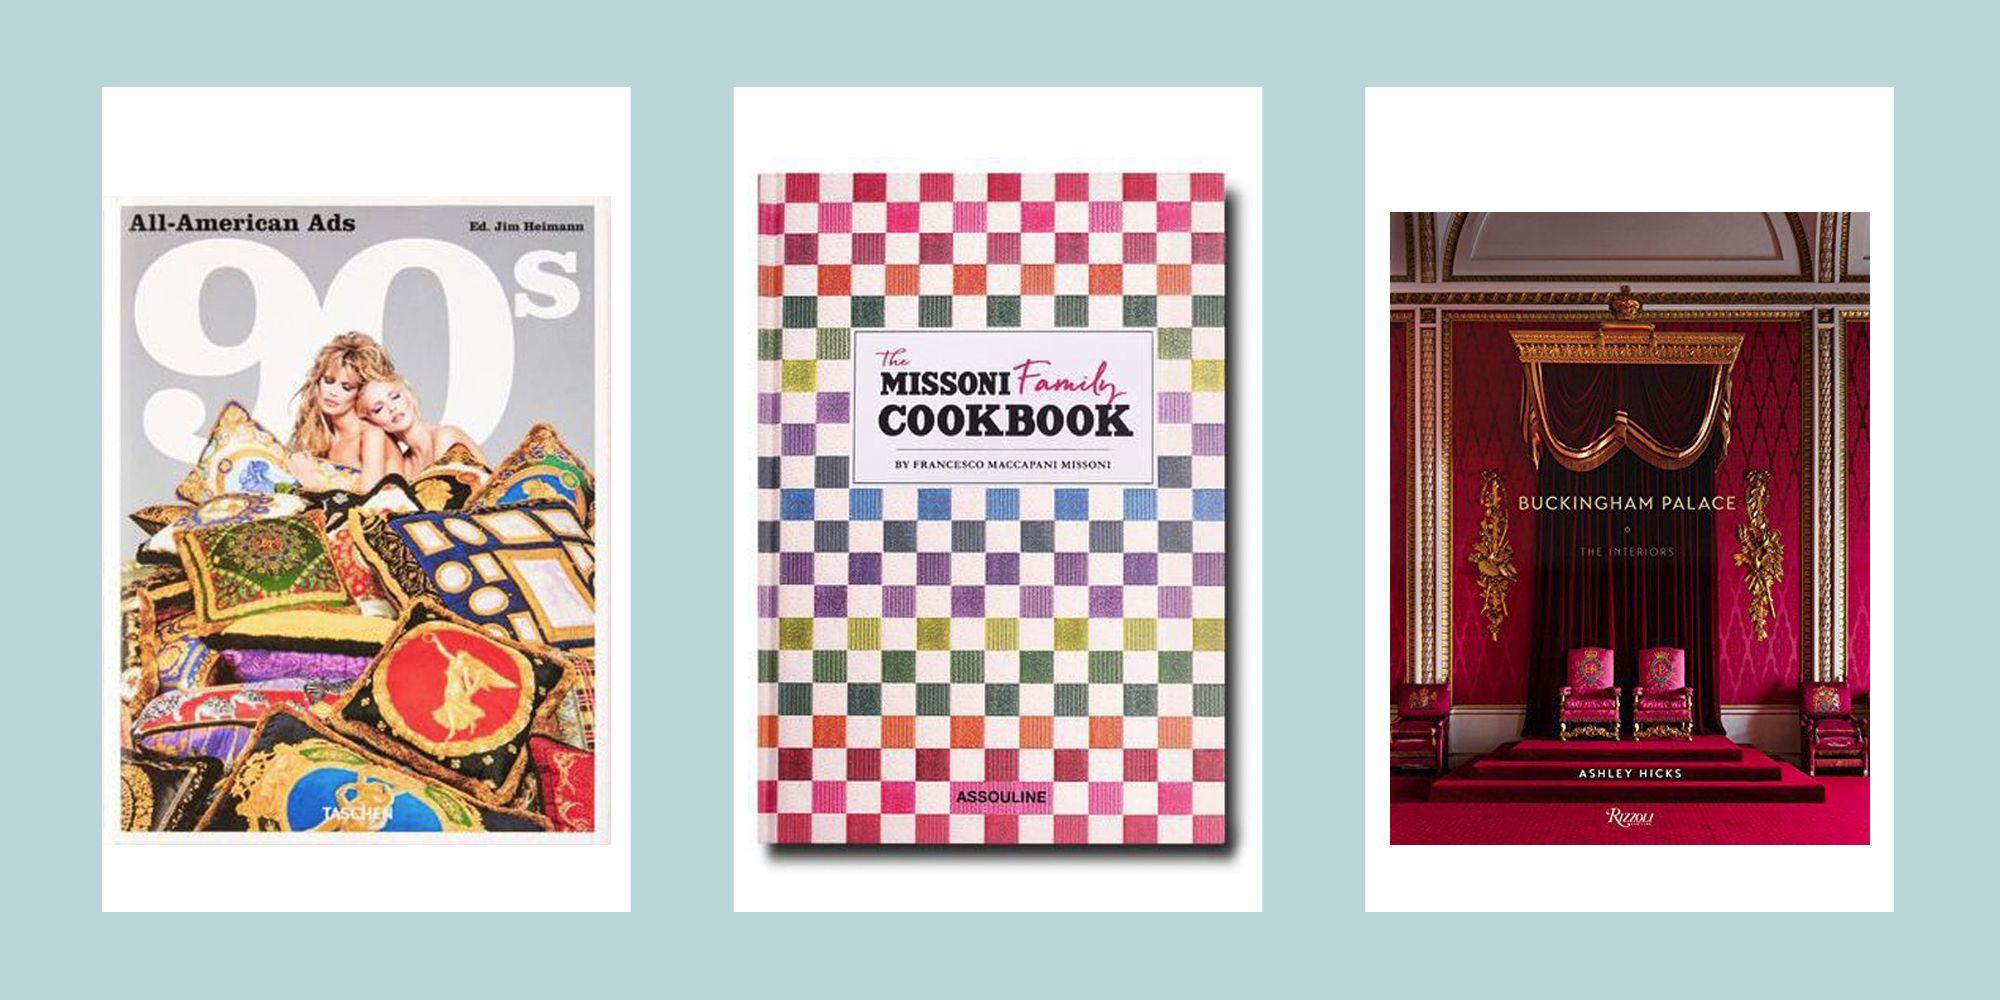 27 best coffee table books 2019 elegant oversized books to display rh elledecor com